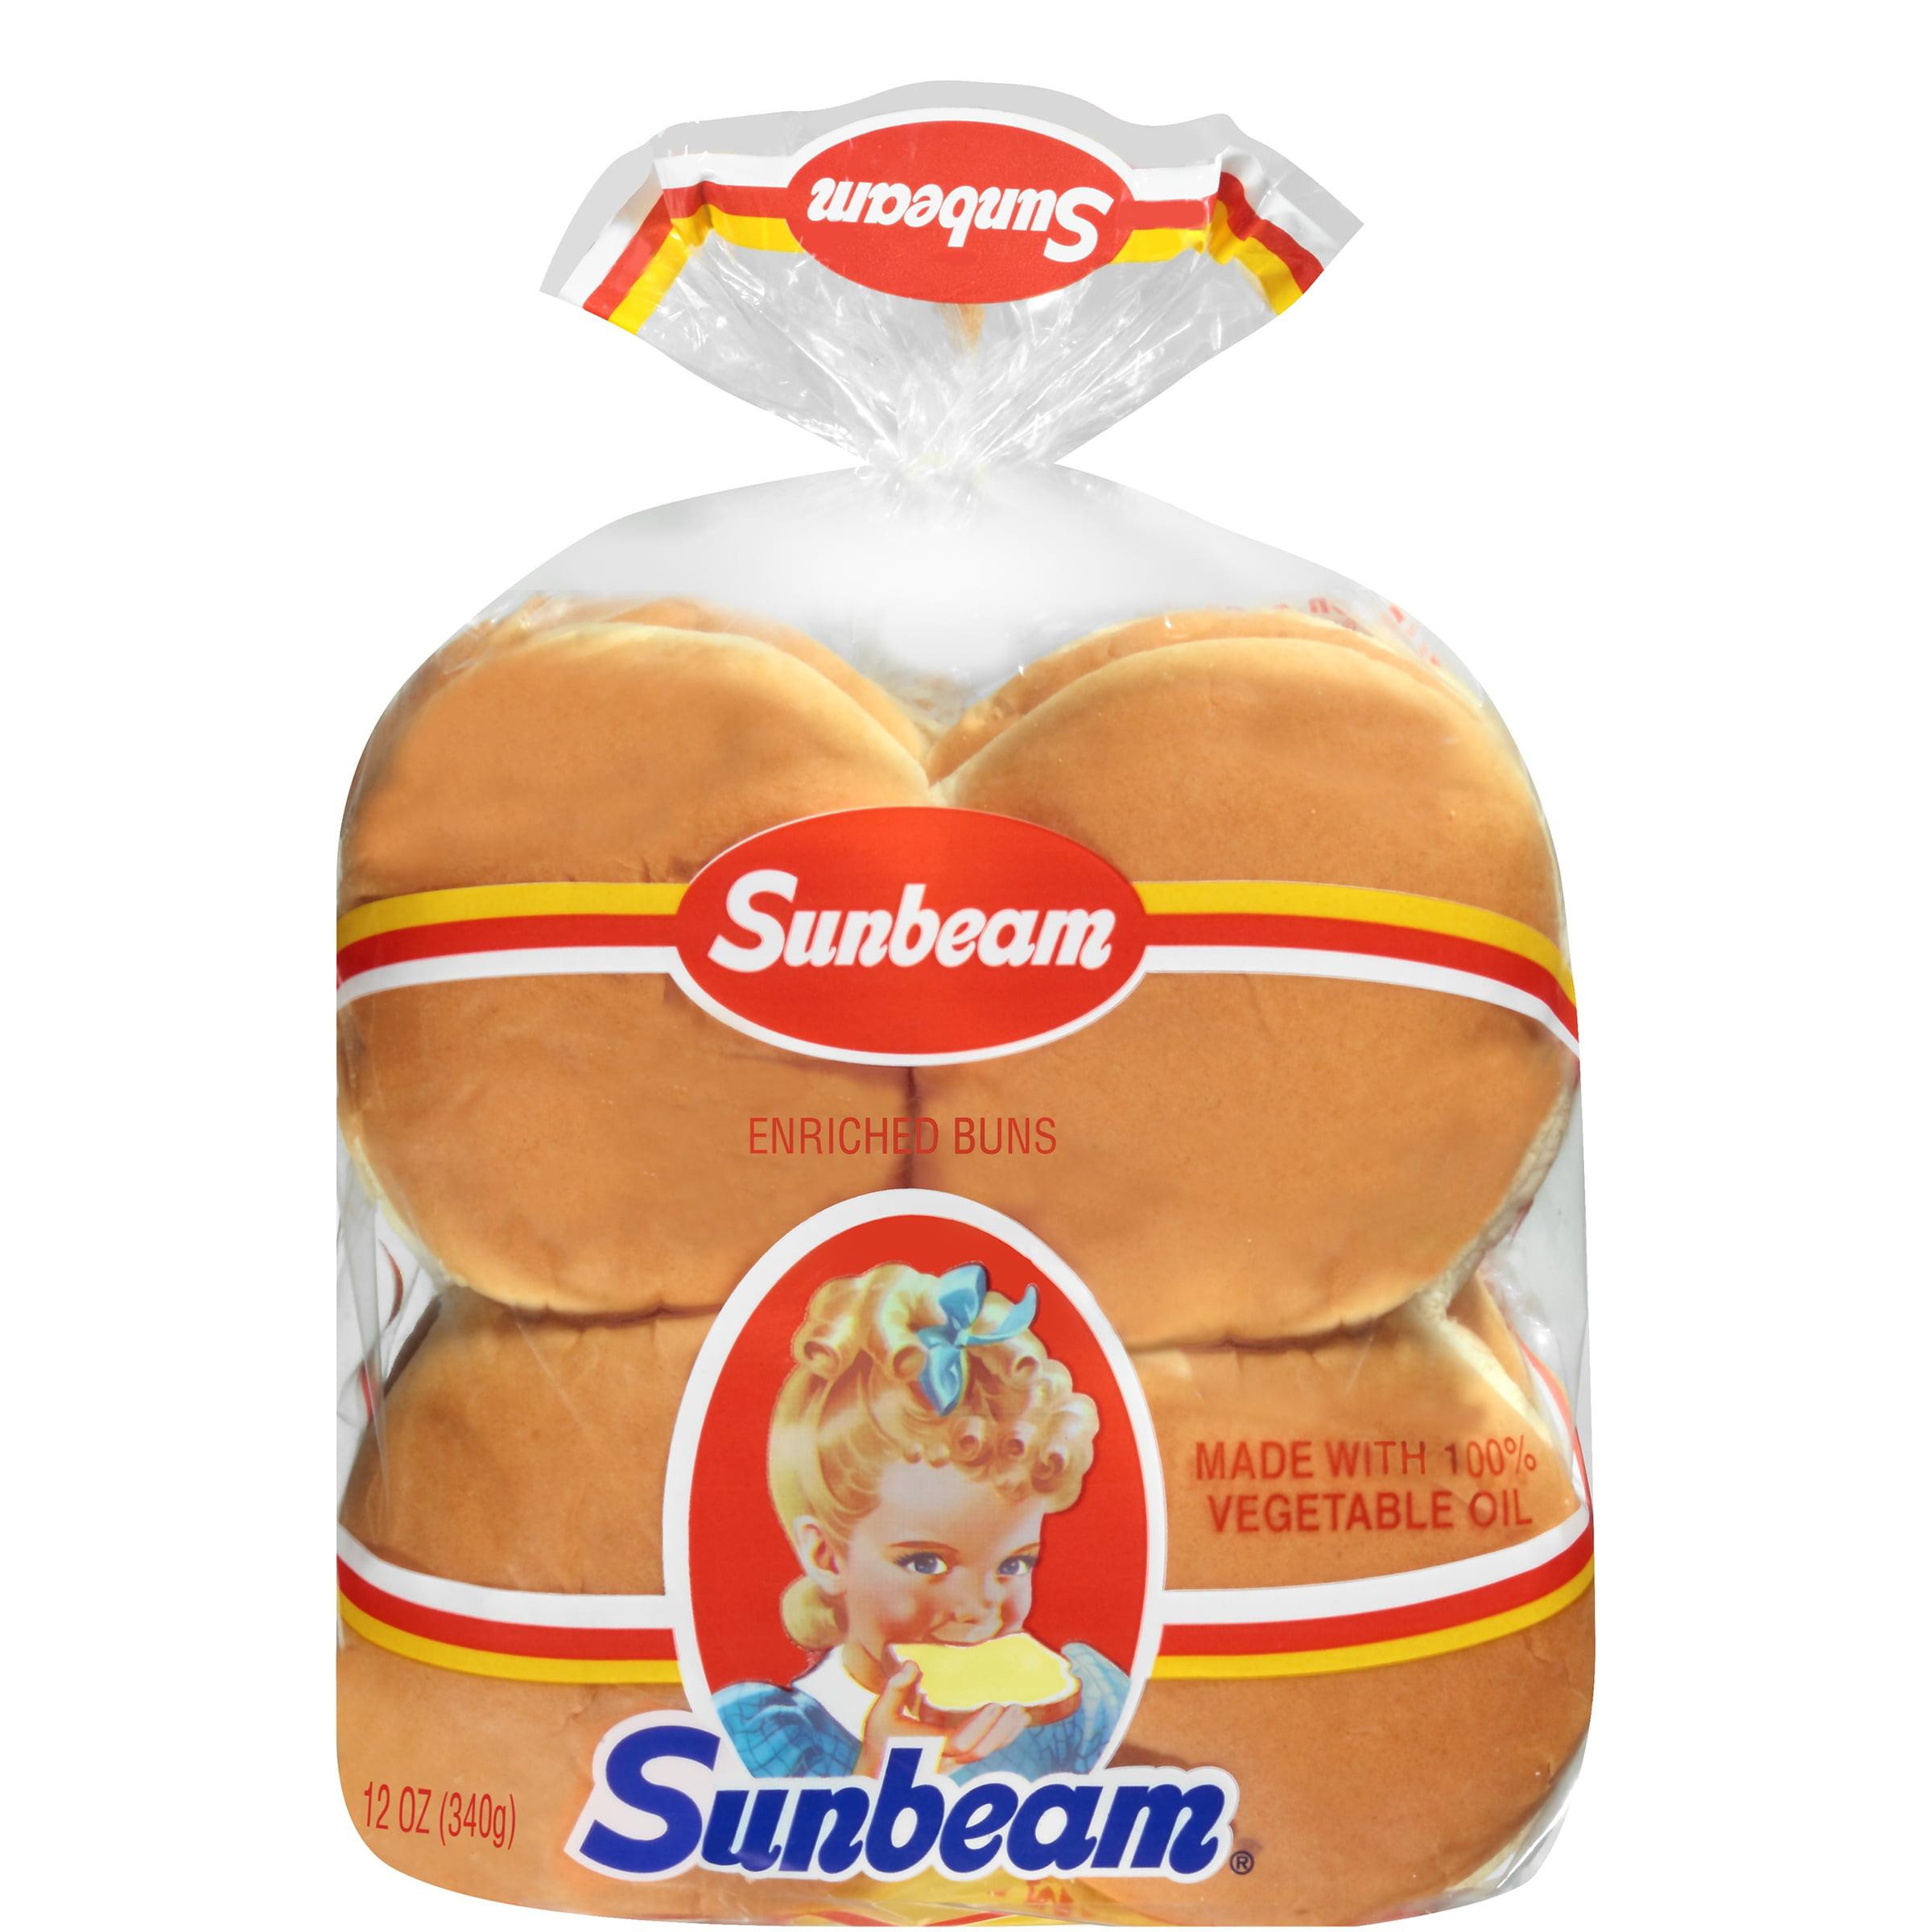 Sunbeam® White Enriched Hamburger Buns 8 ct 12 oz. Bag